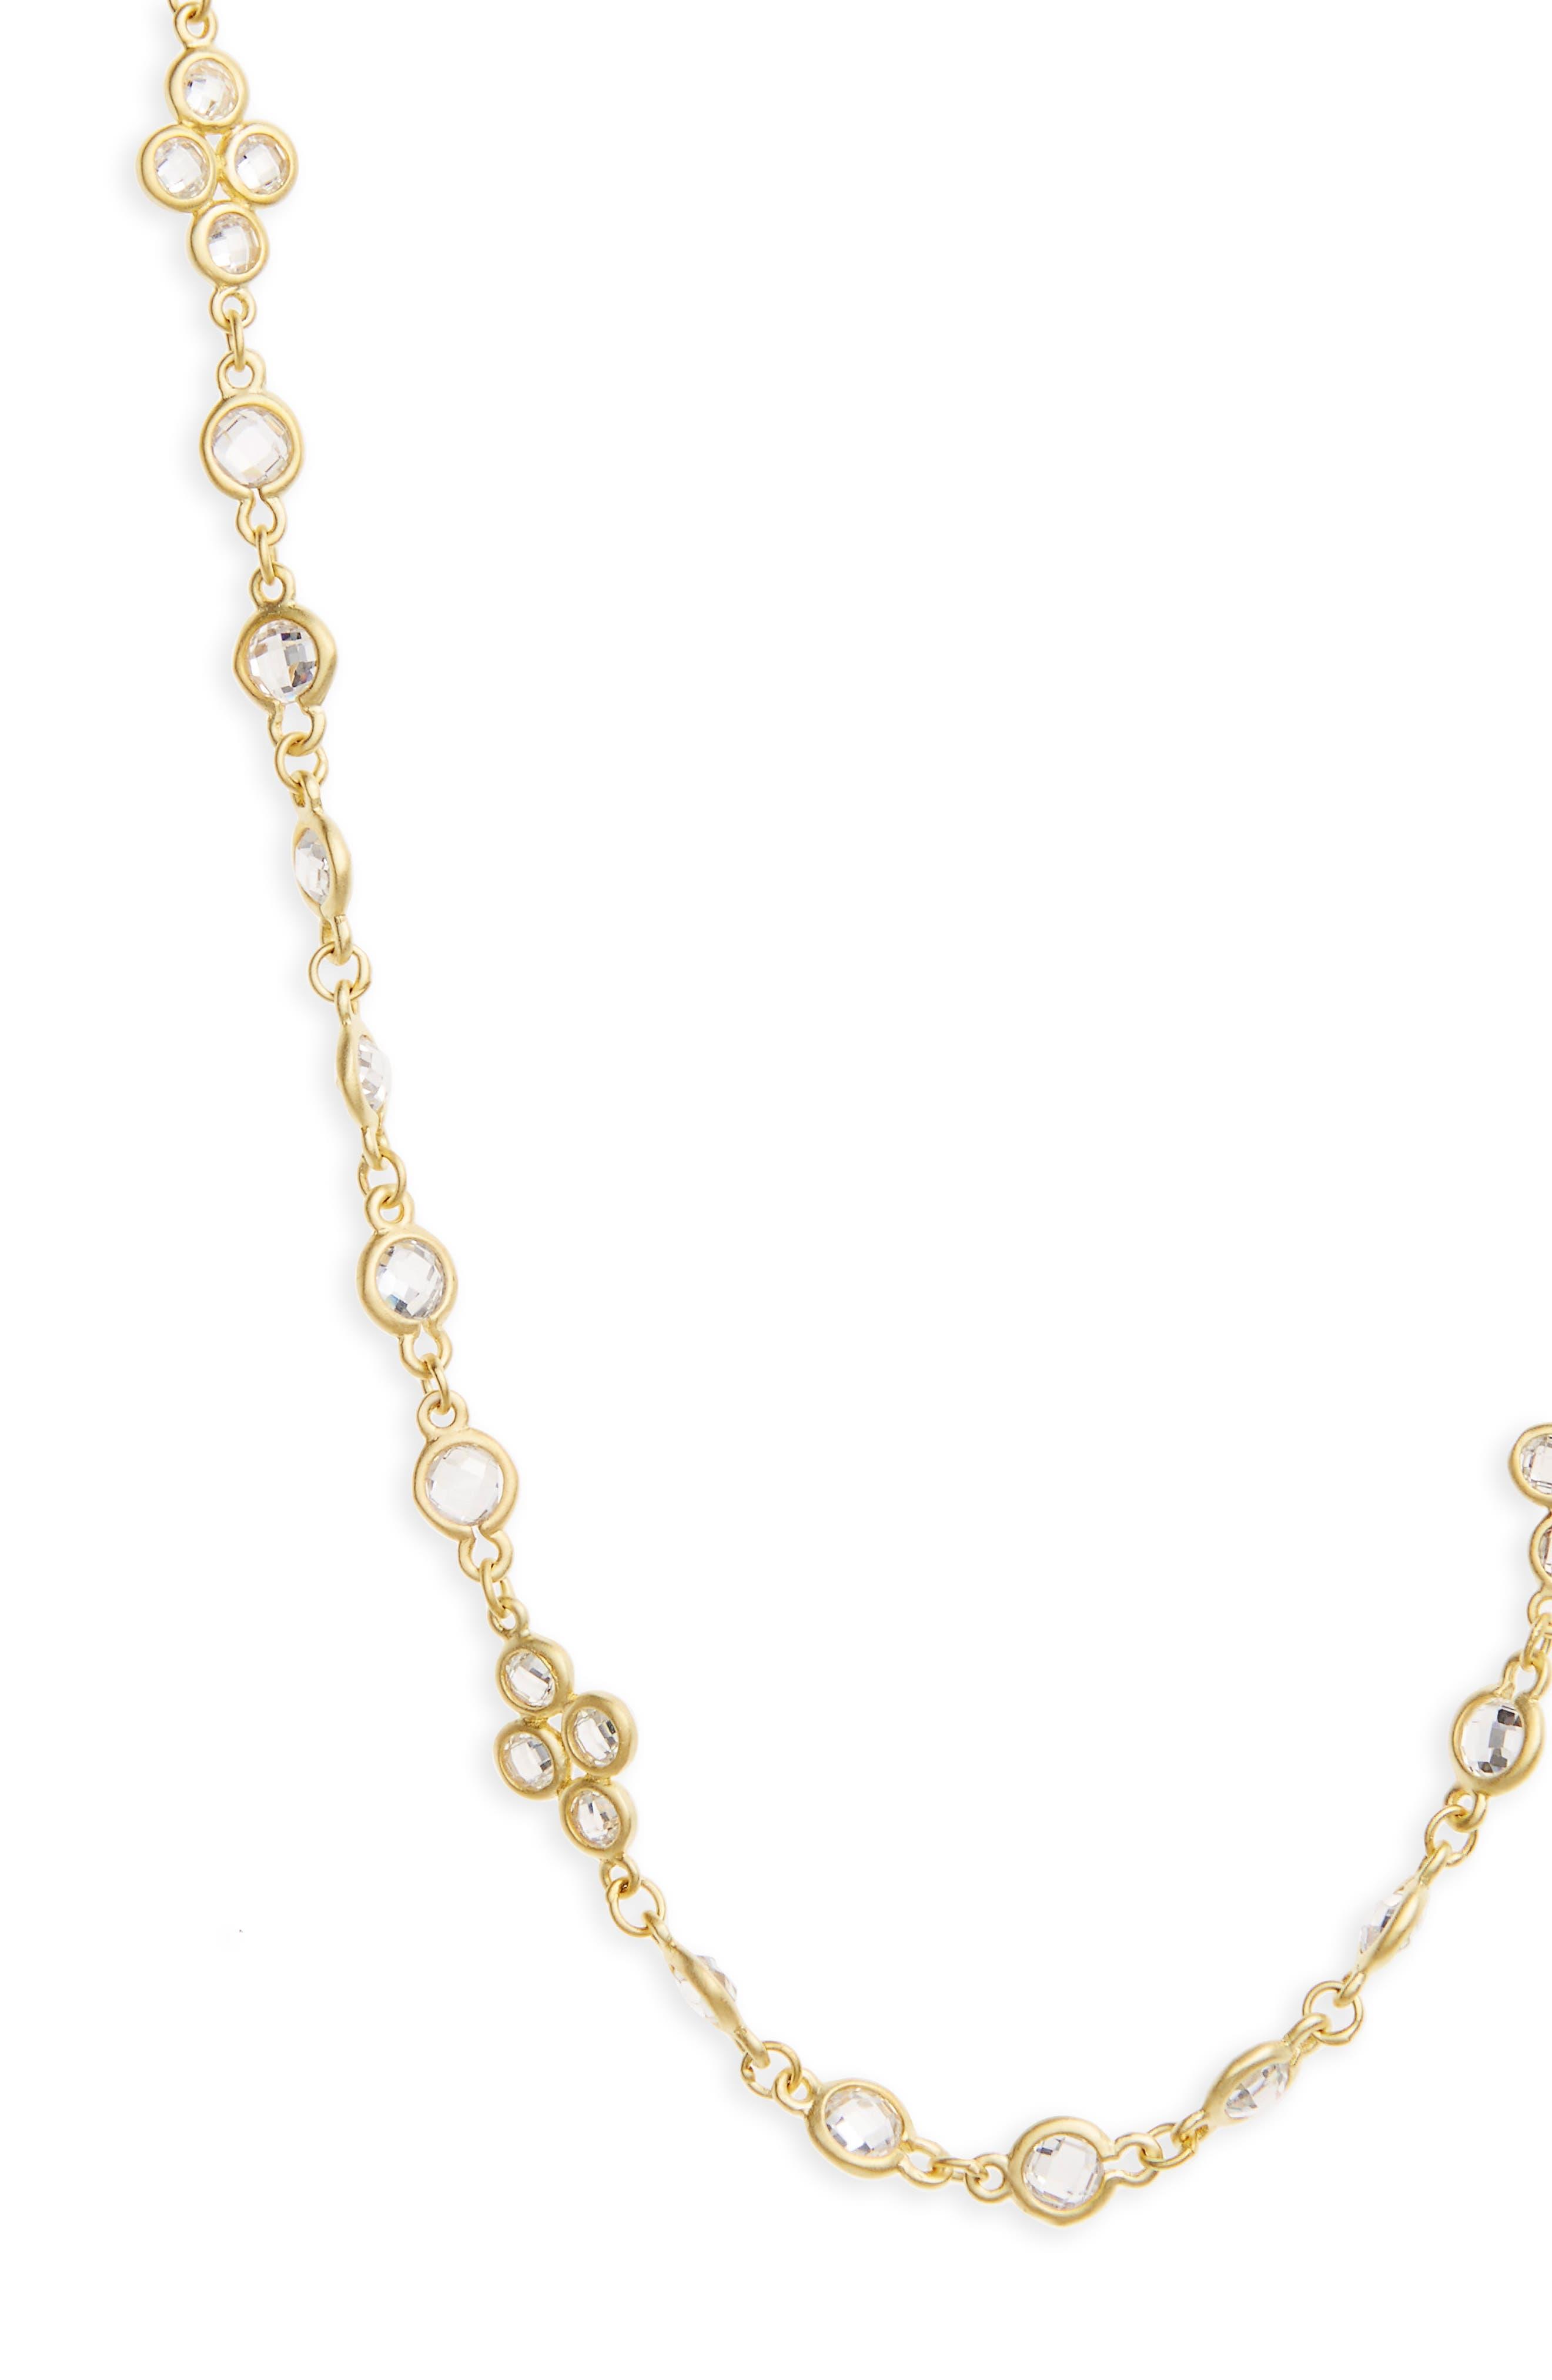 Cubic Zirconia Necklace,                             Alternate thumbnail 2, color,                             710